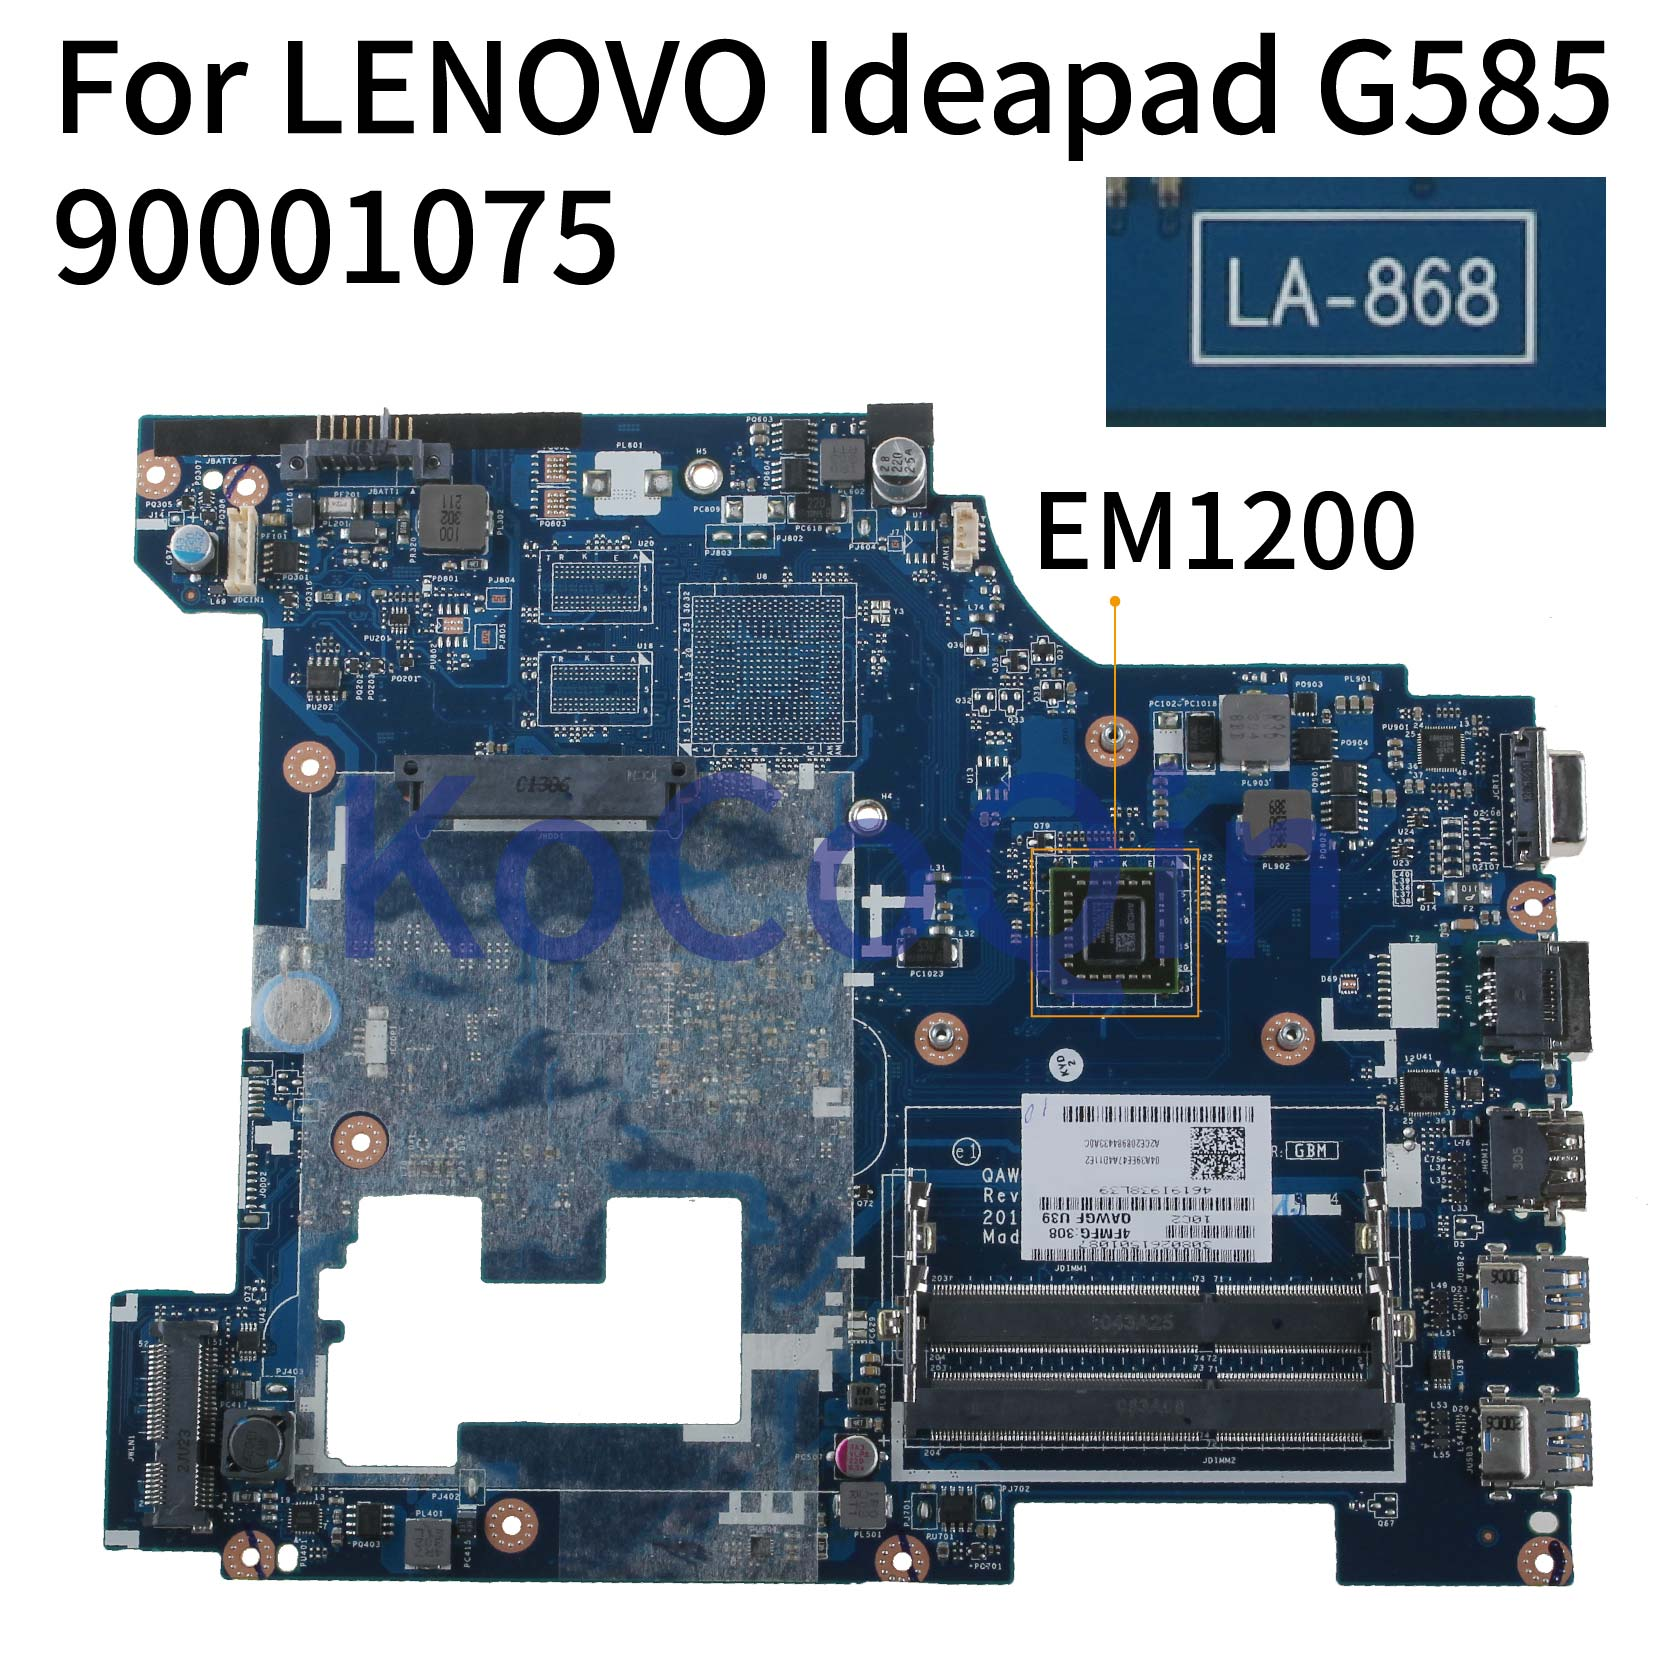 KoCoQin Laptop motherboard For LENOVO Ideapad G585 15.6' Inch Mainboard LA 8681P 90001075 EM1200|Laptop Motherboard| |  - title=